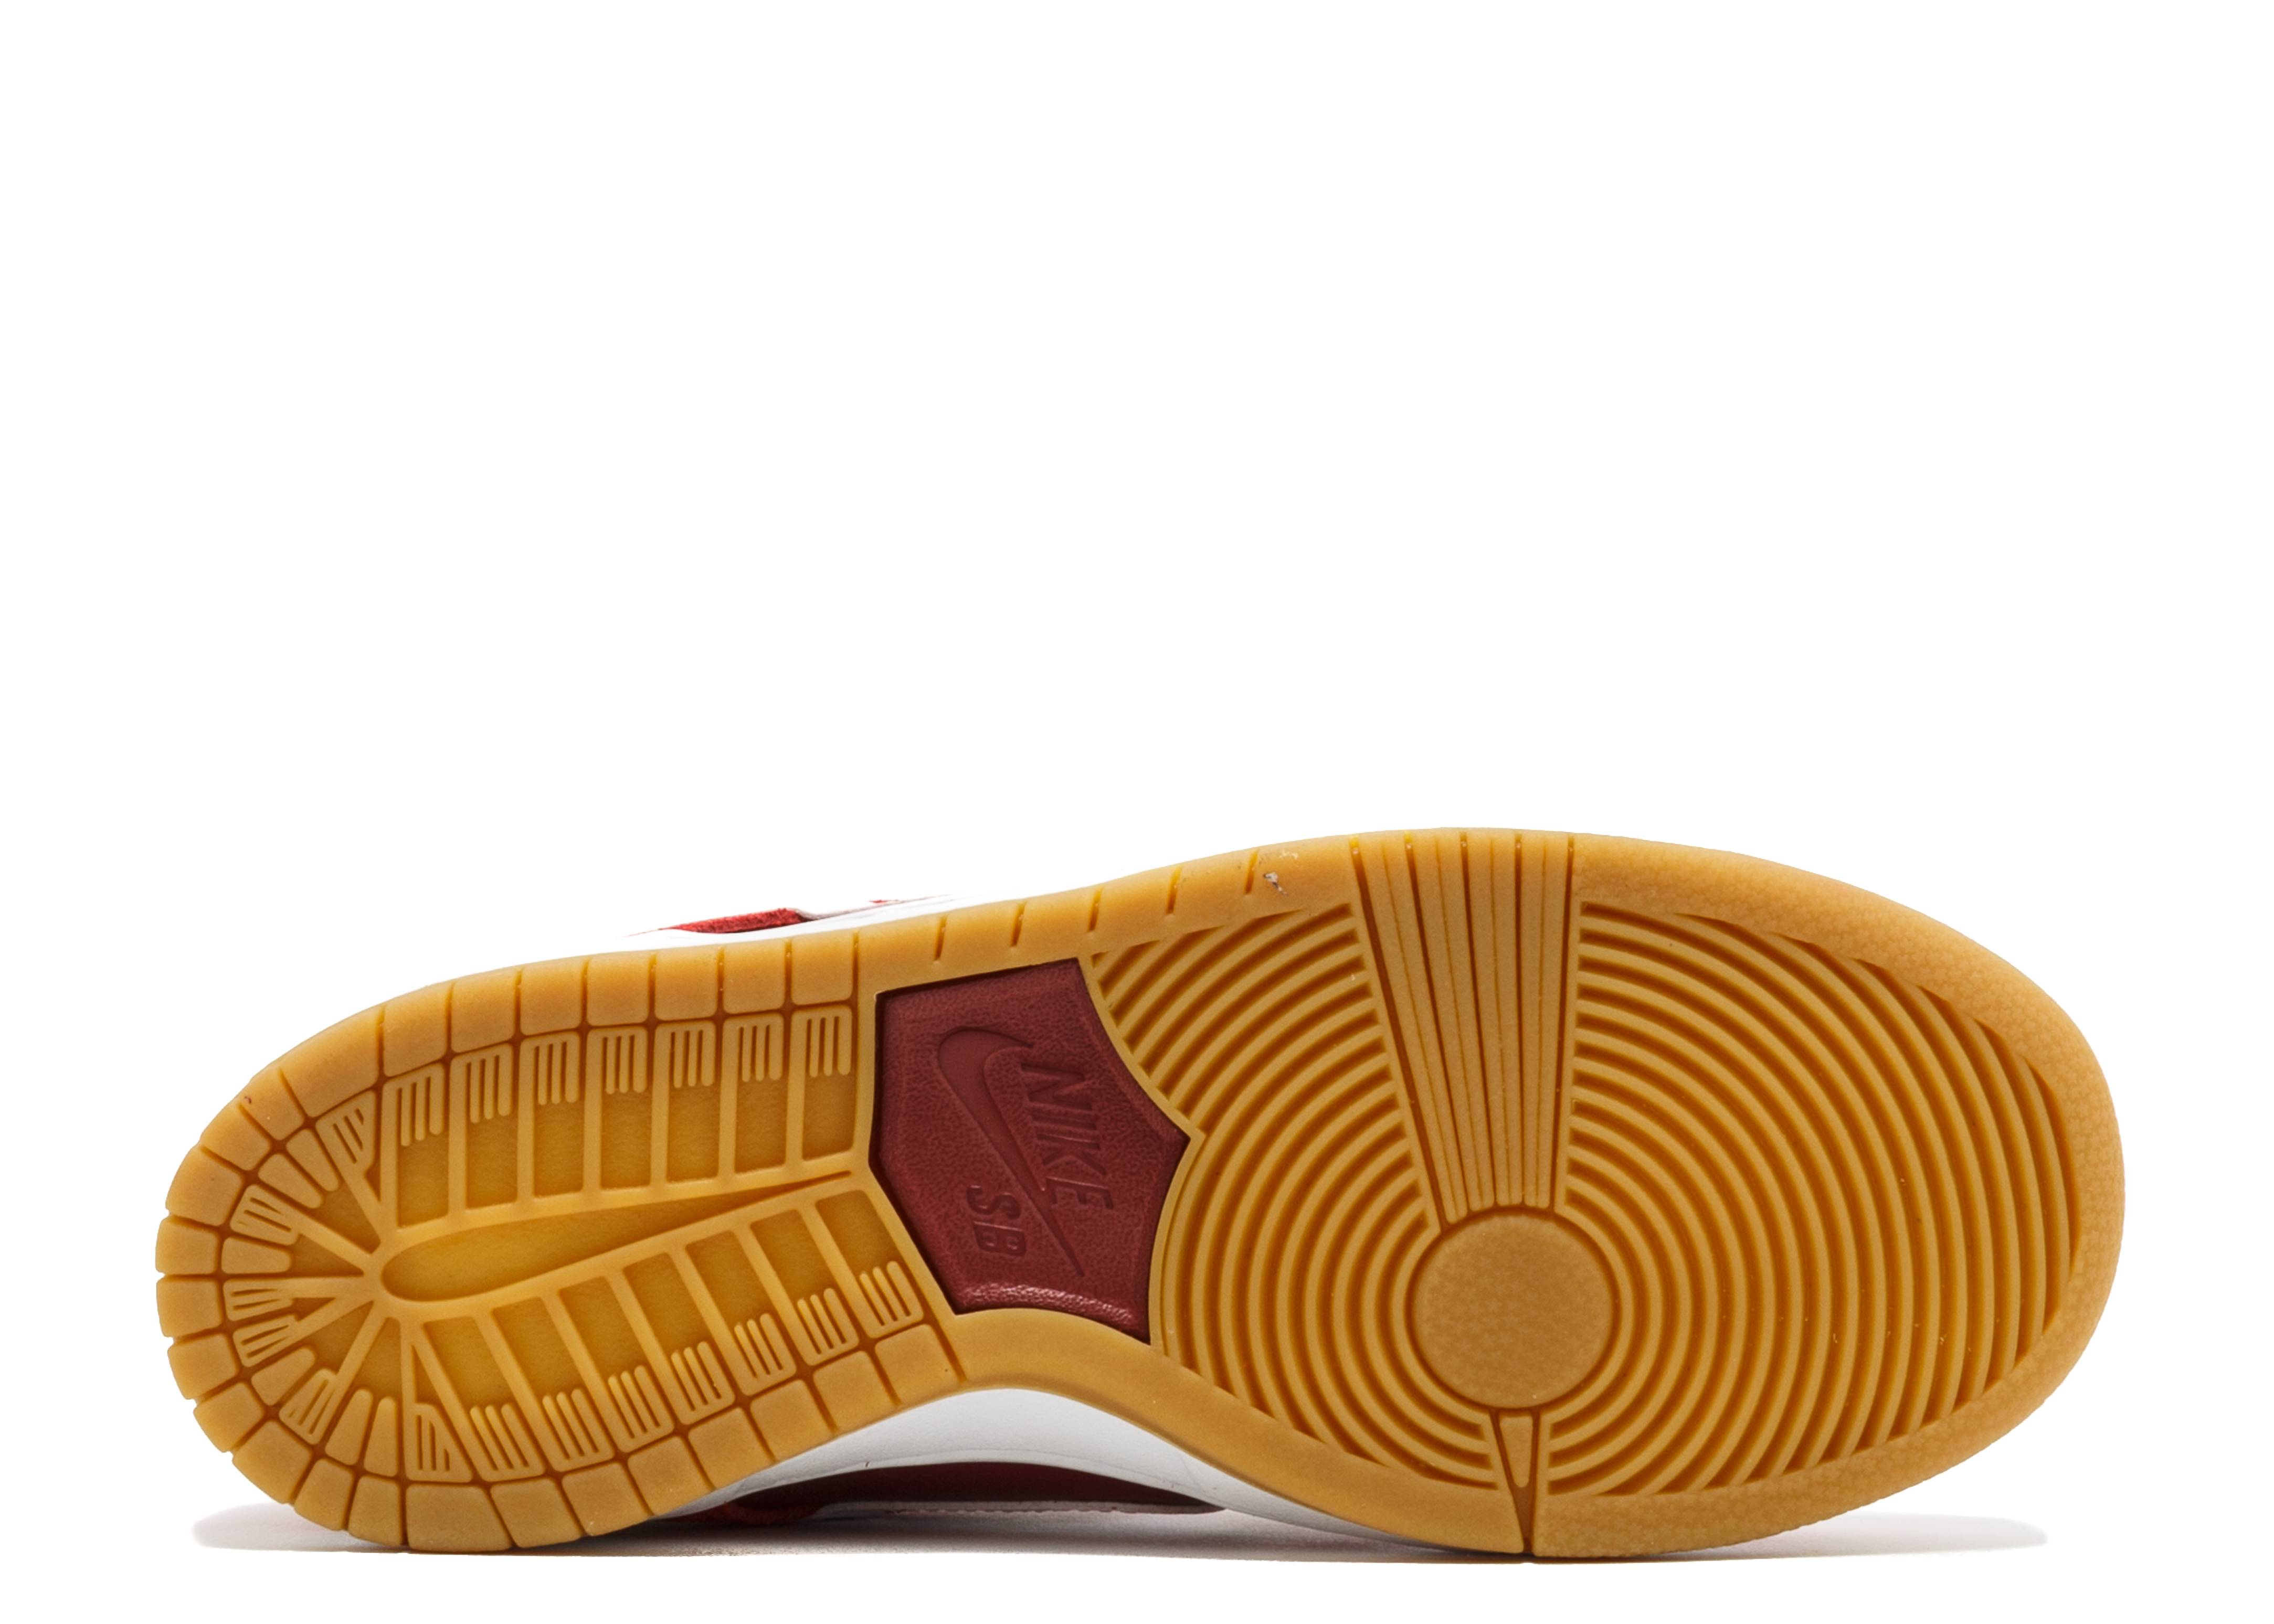 44984df7d317 Nike Sb Zoom Dunk Low Pro - Nike - 854866 616 - track red white-cedar